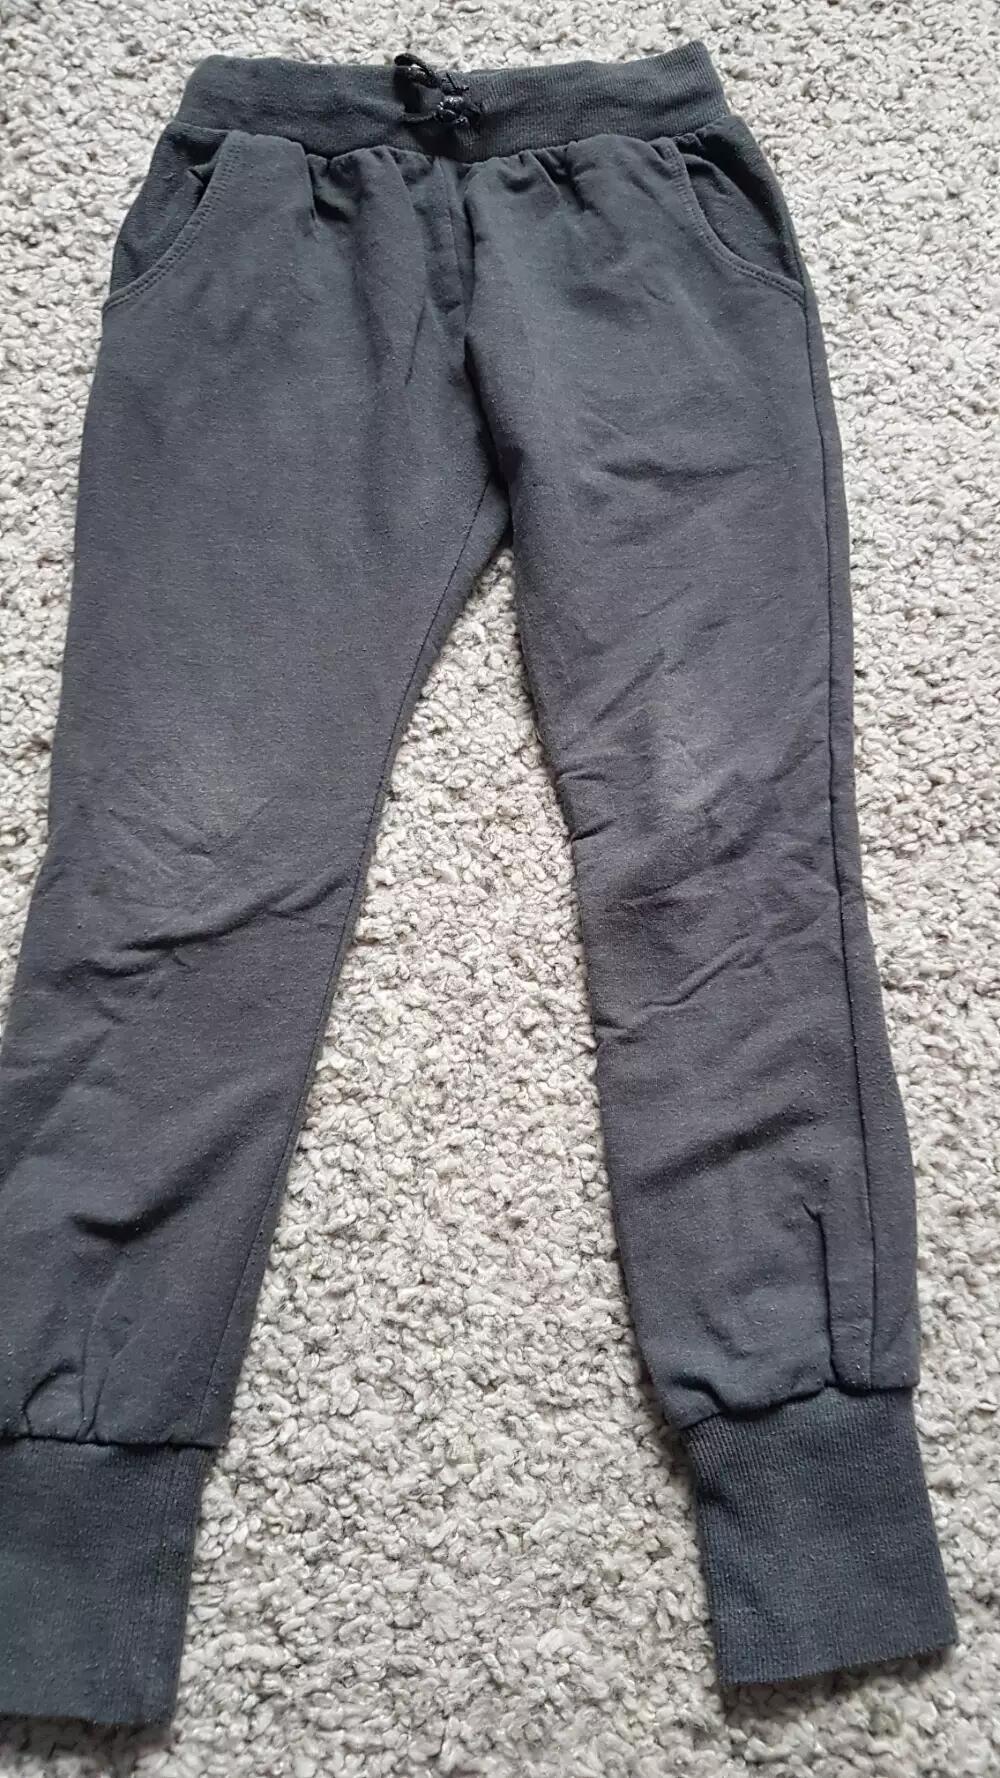 Mads og Mette bukser